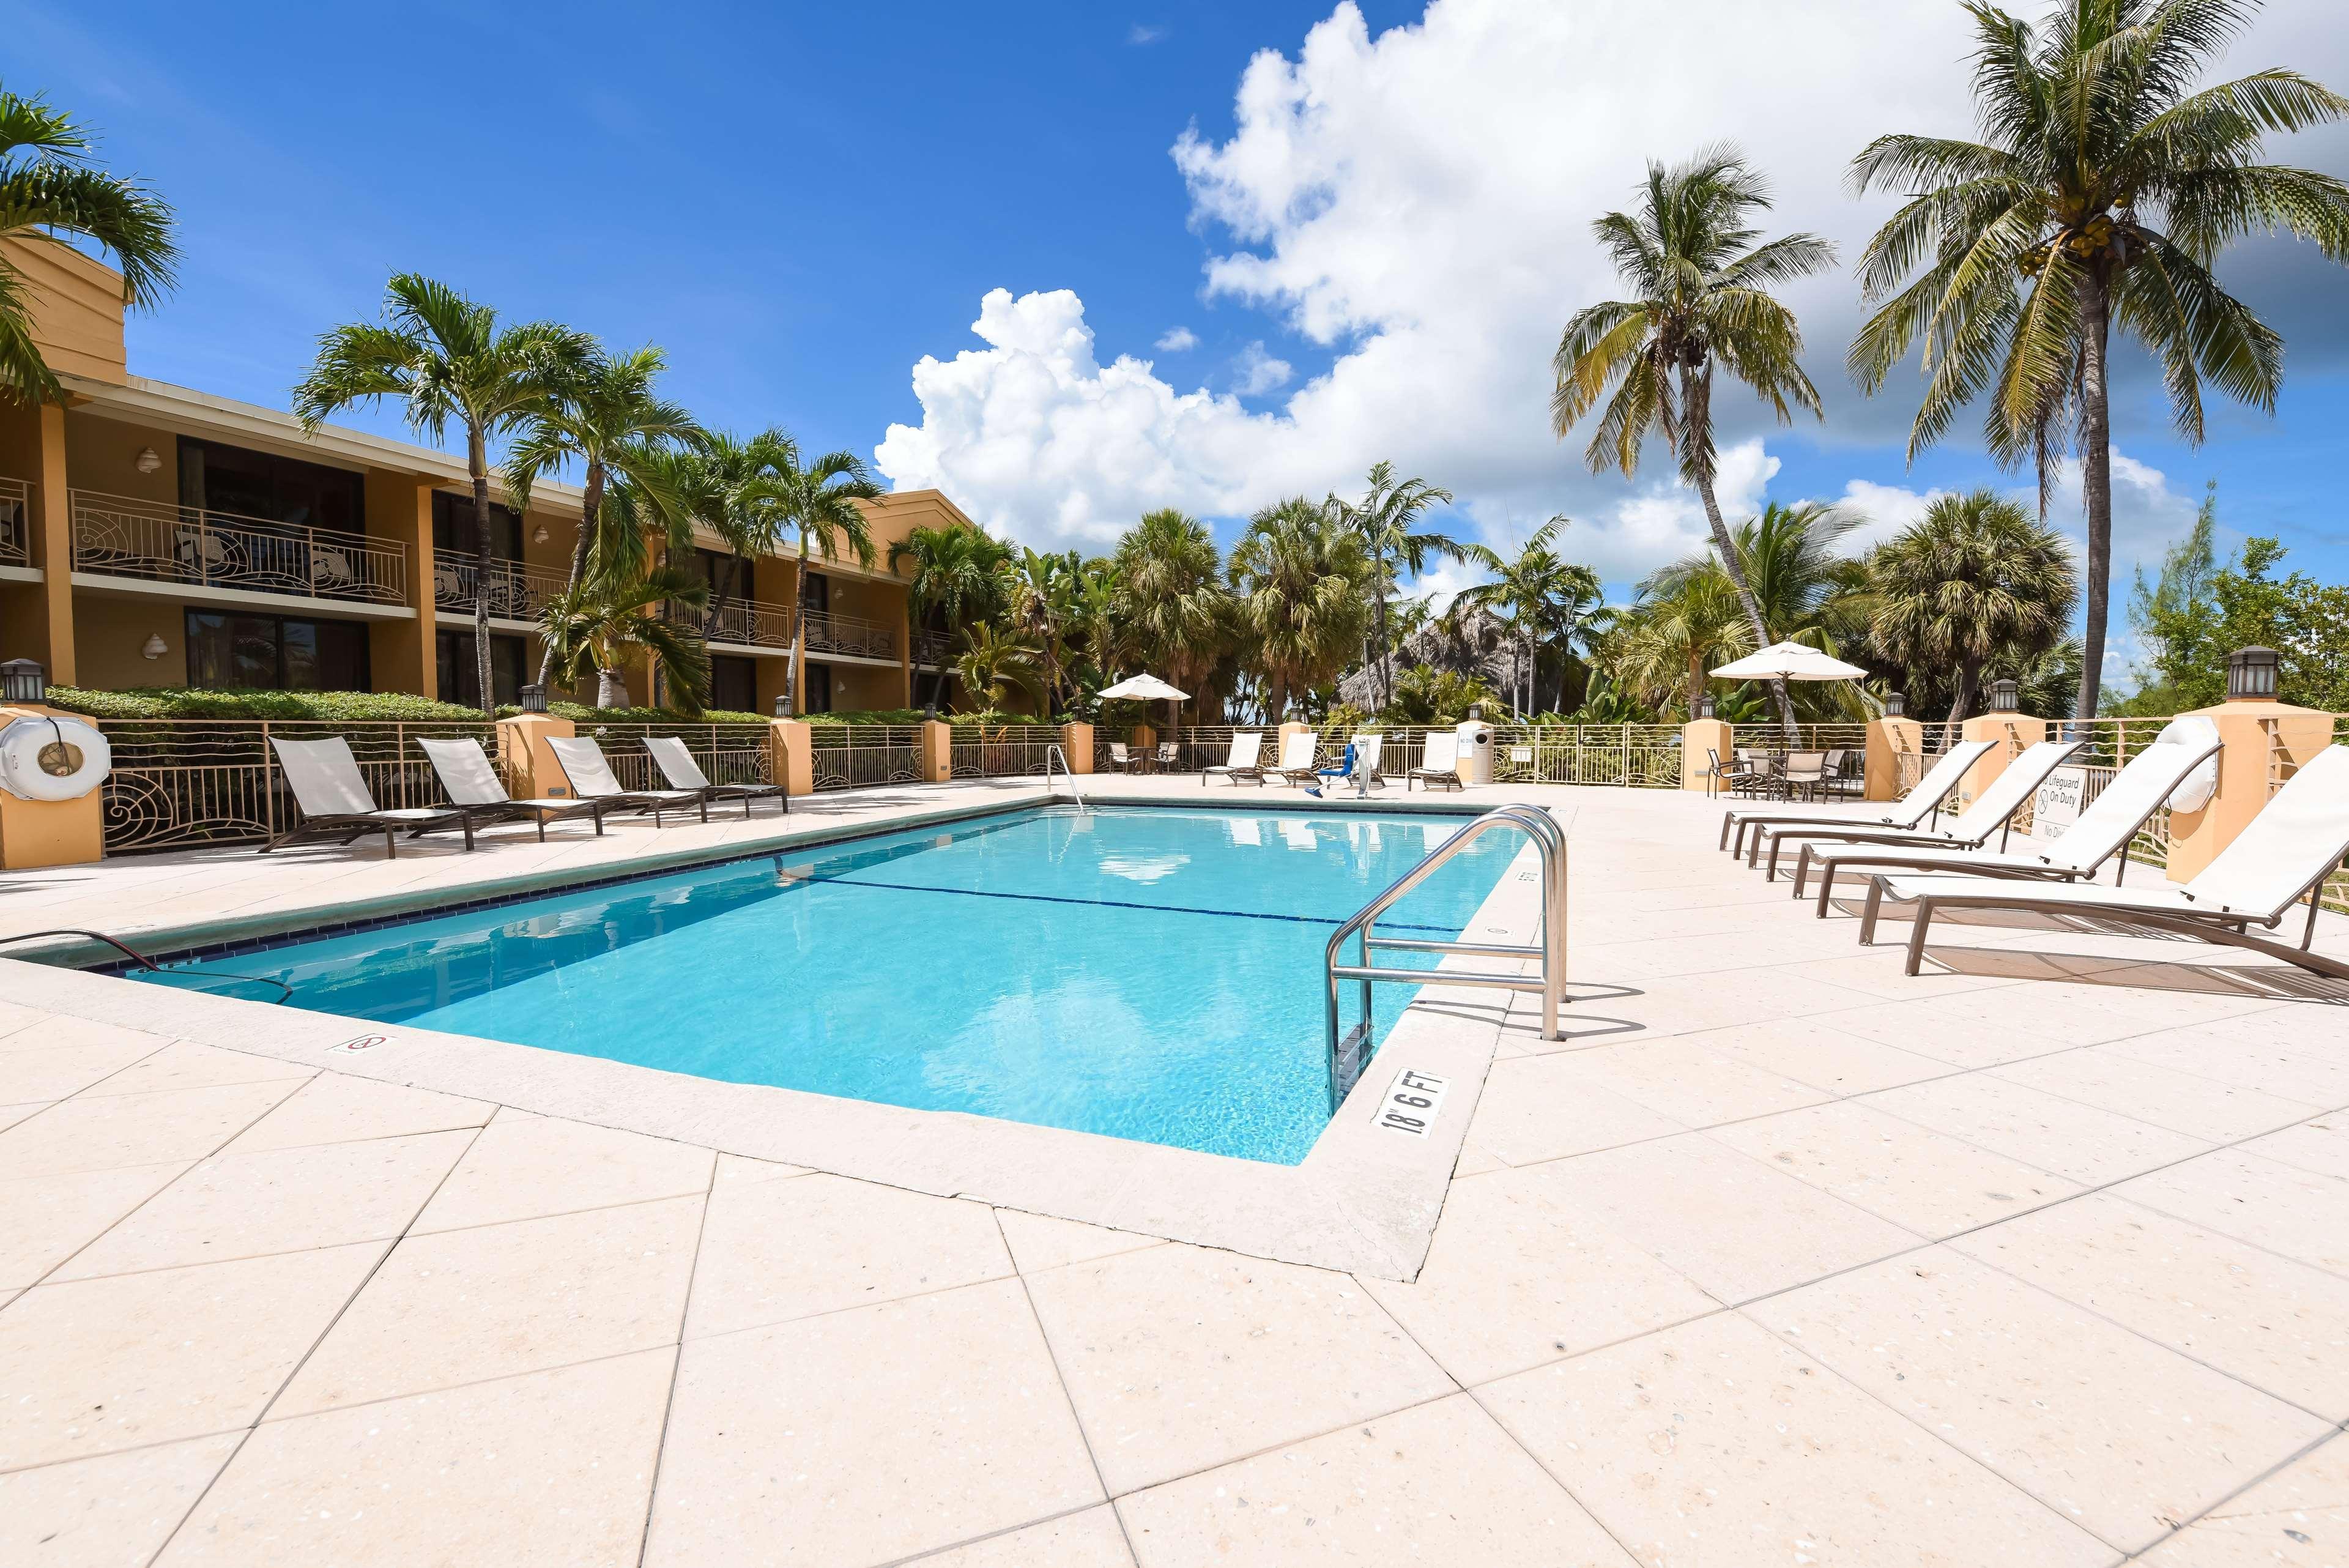 Hampton Inn Key Largo, FL image 13